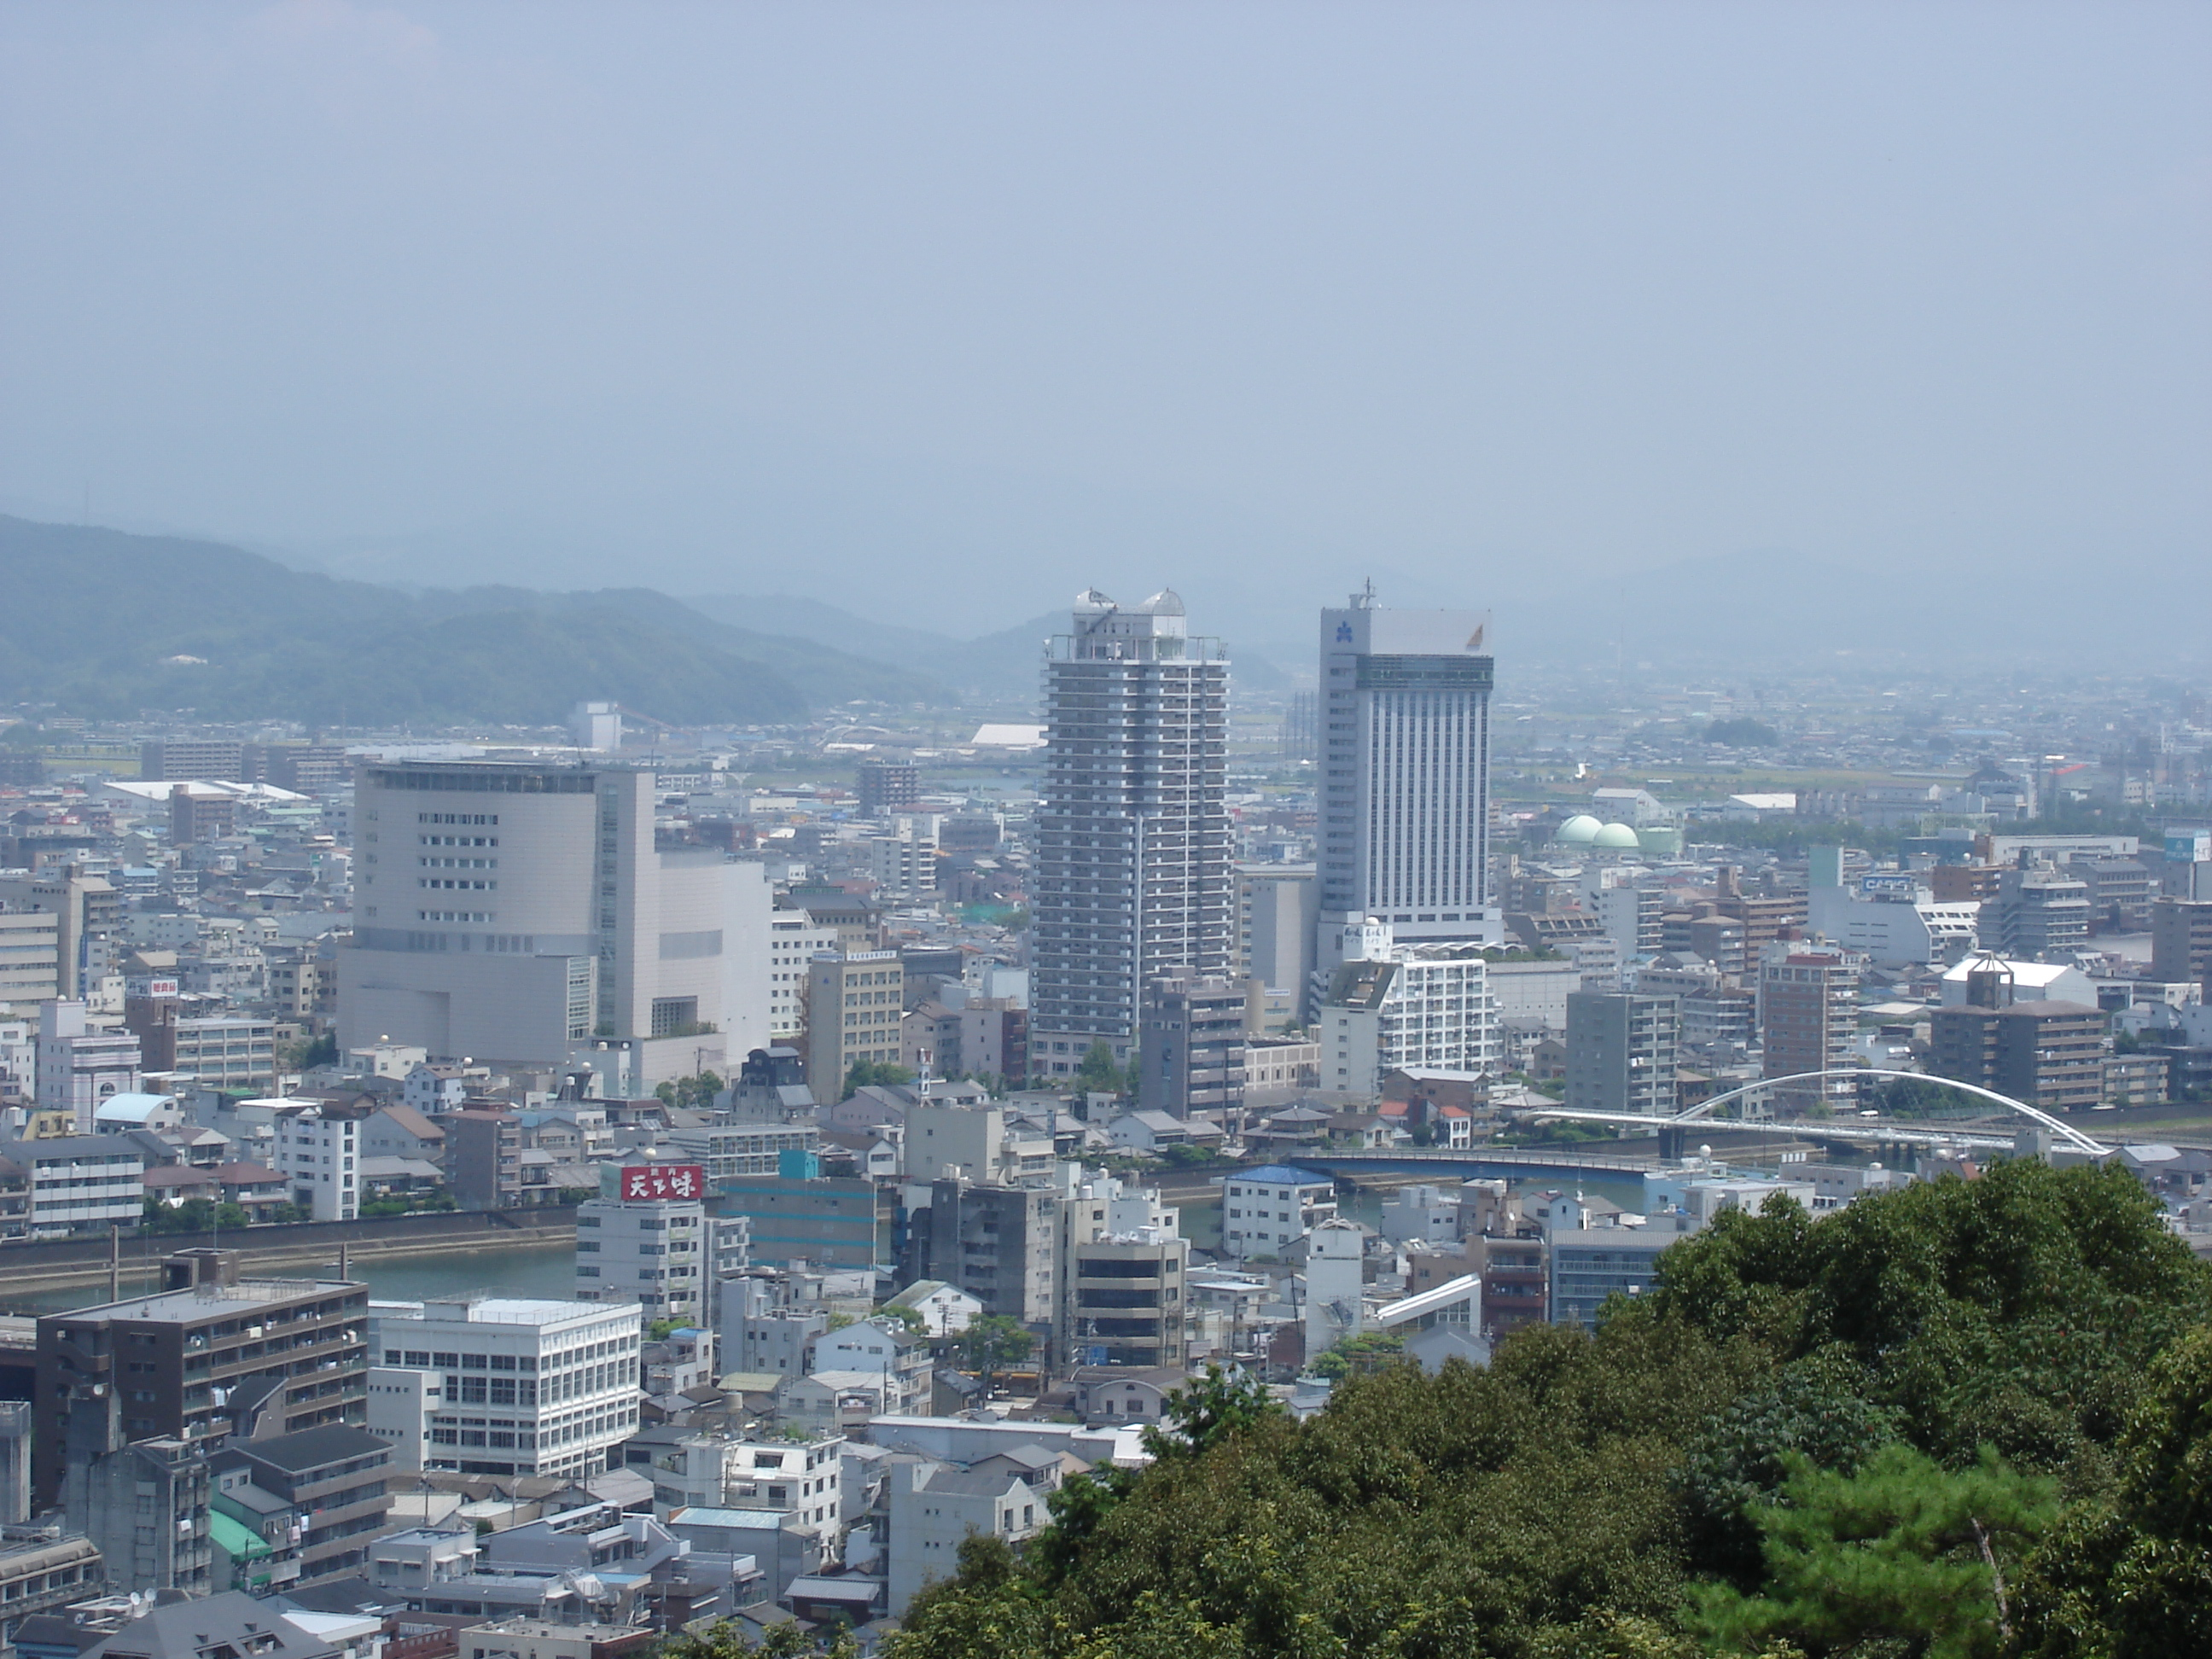 Kochi Japan  city photos gallery : Kochi Japan Simple English Wikipedia, the free encyclopedia